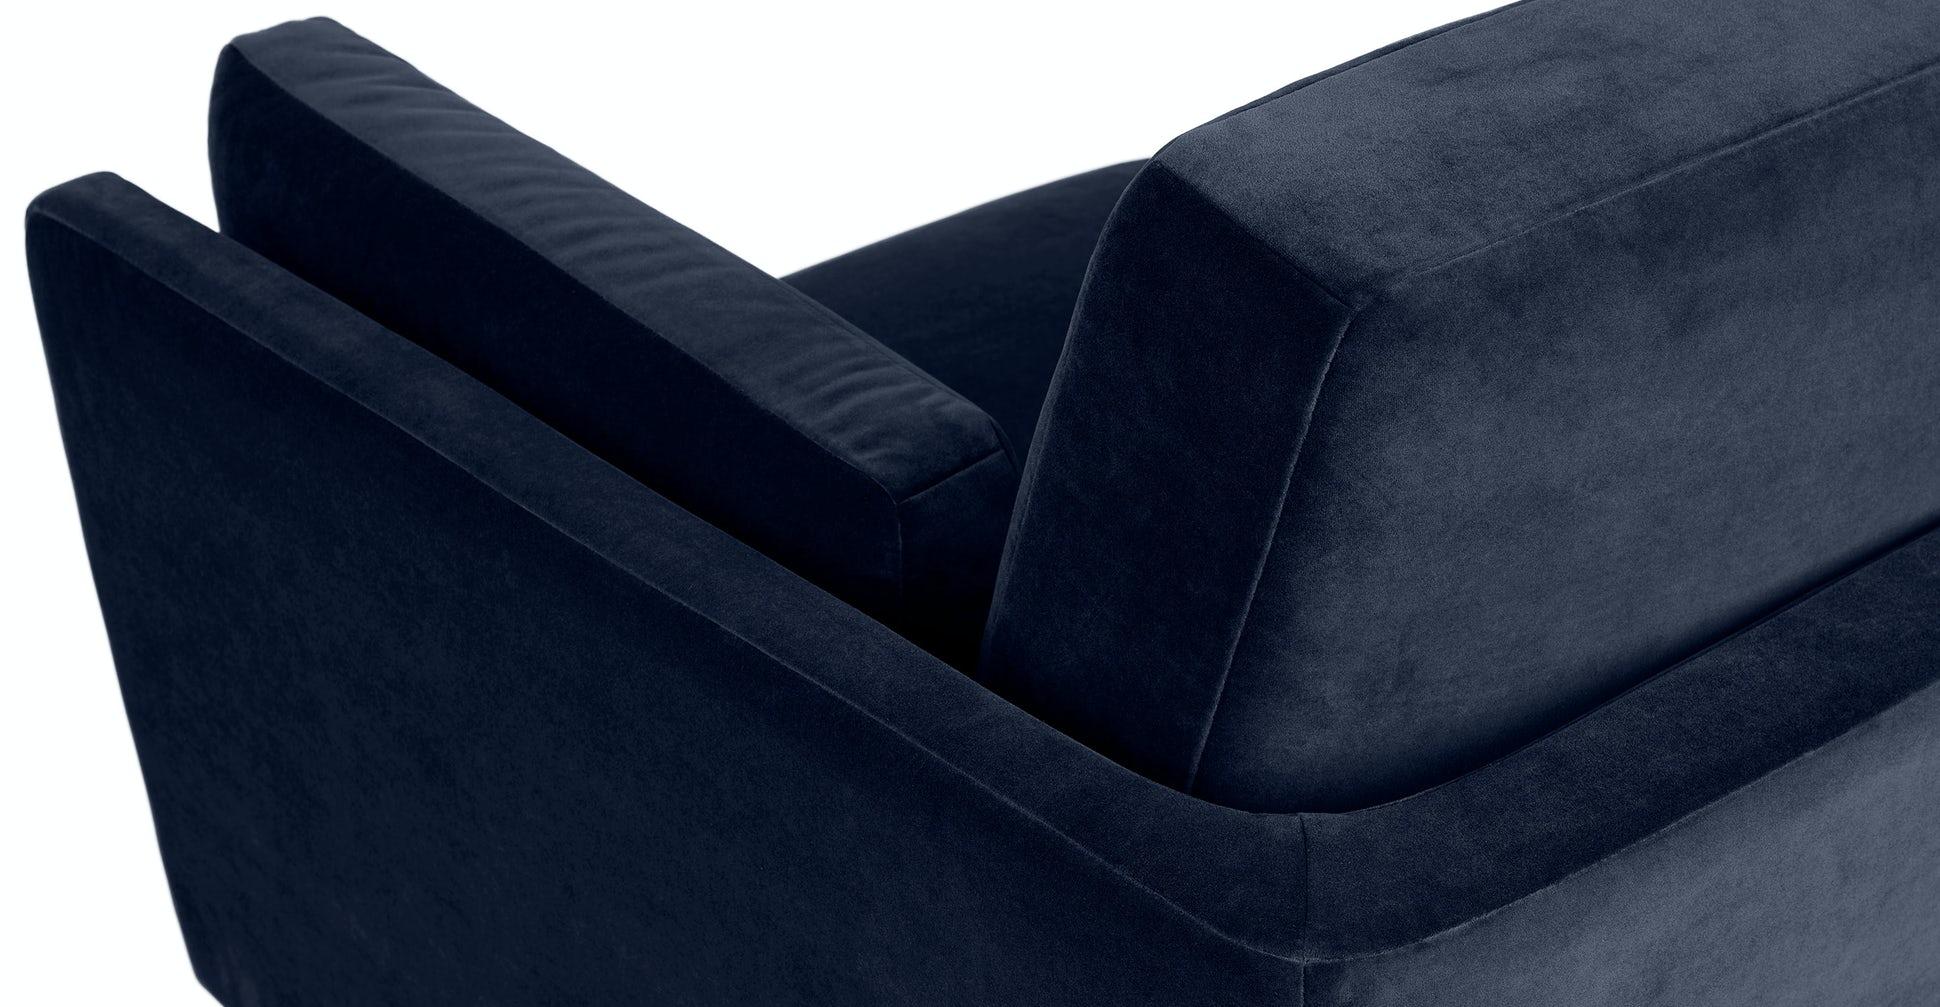 Ceni Maren blue sofa